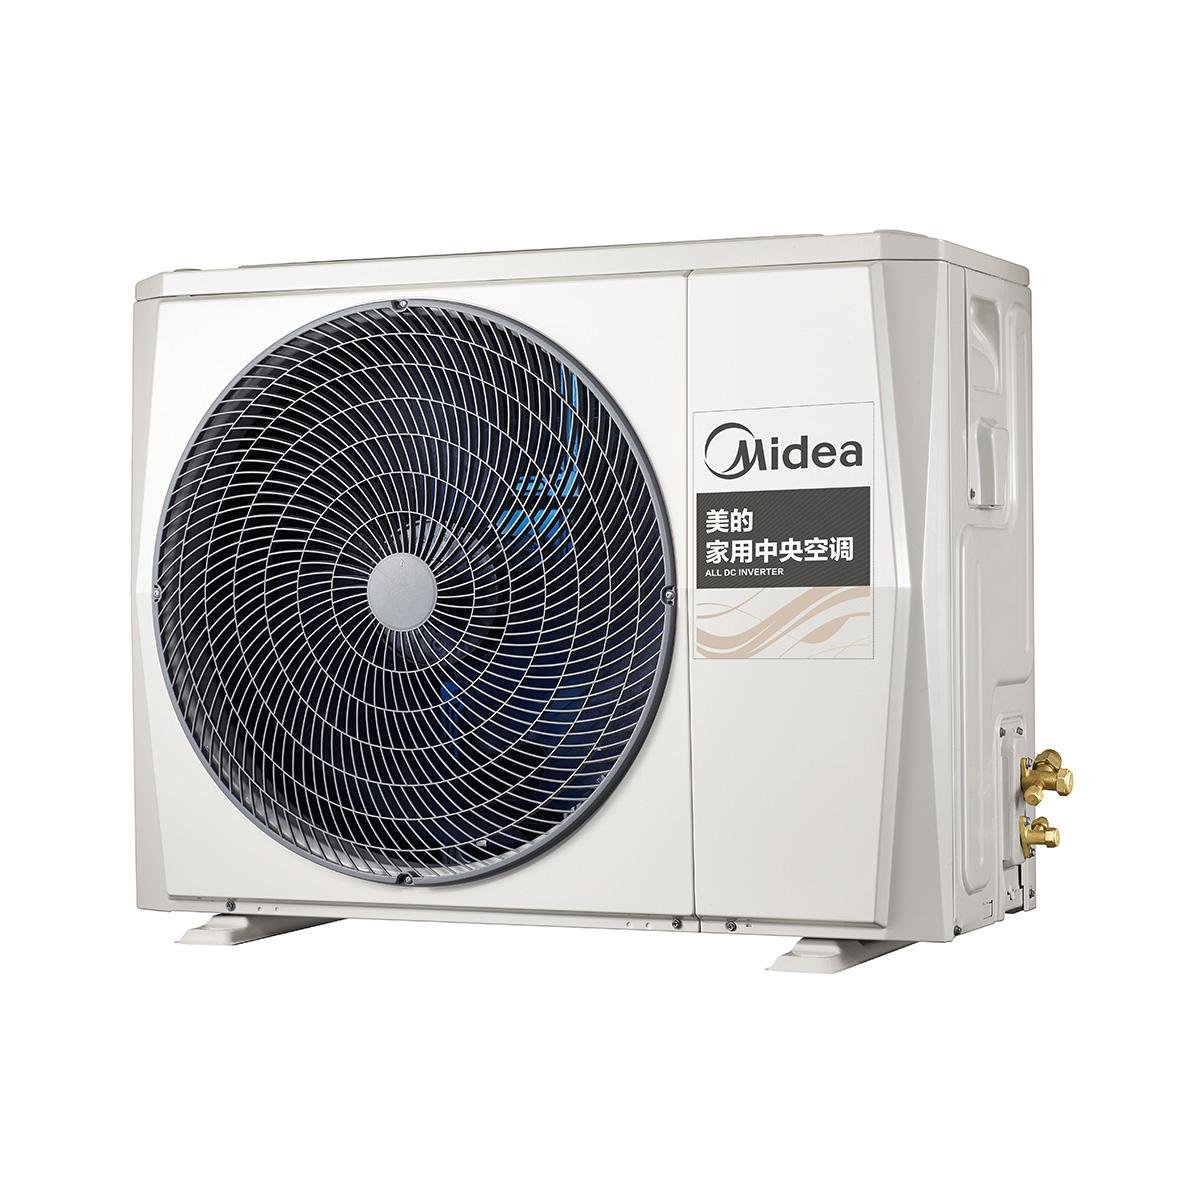 Midea/美的 MDS-H80W-A(E1)中央空调外机 说明书.pdf